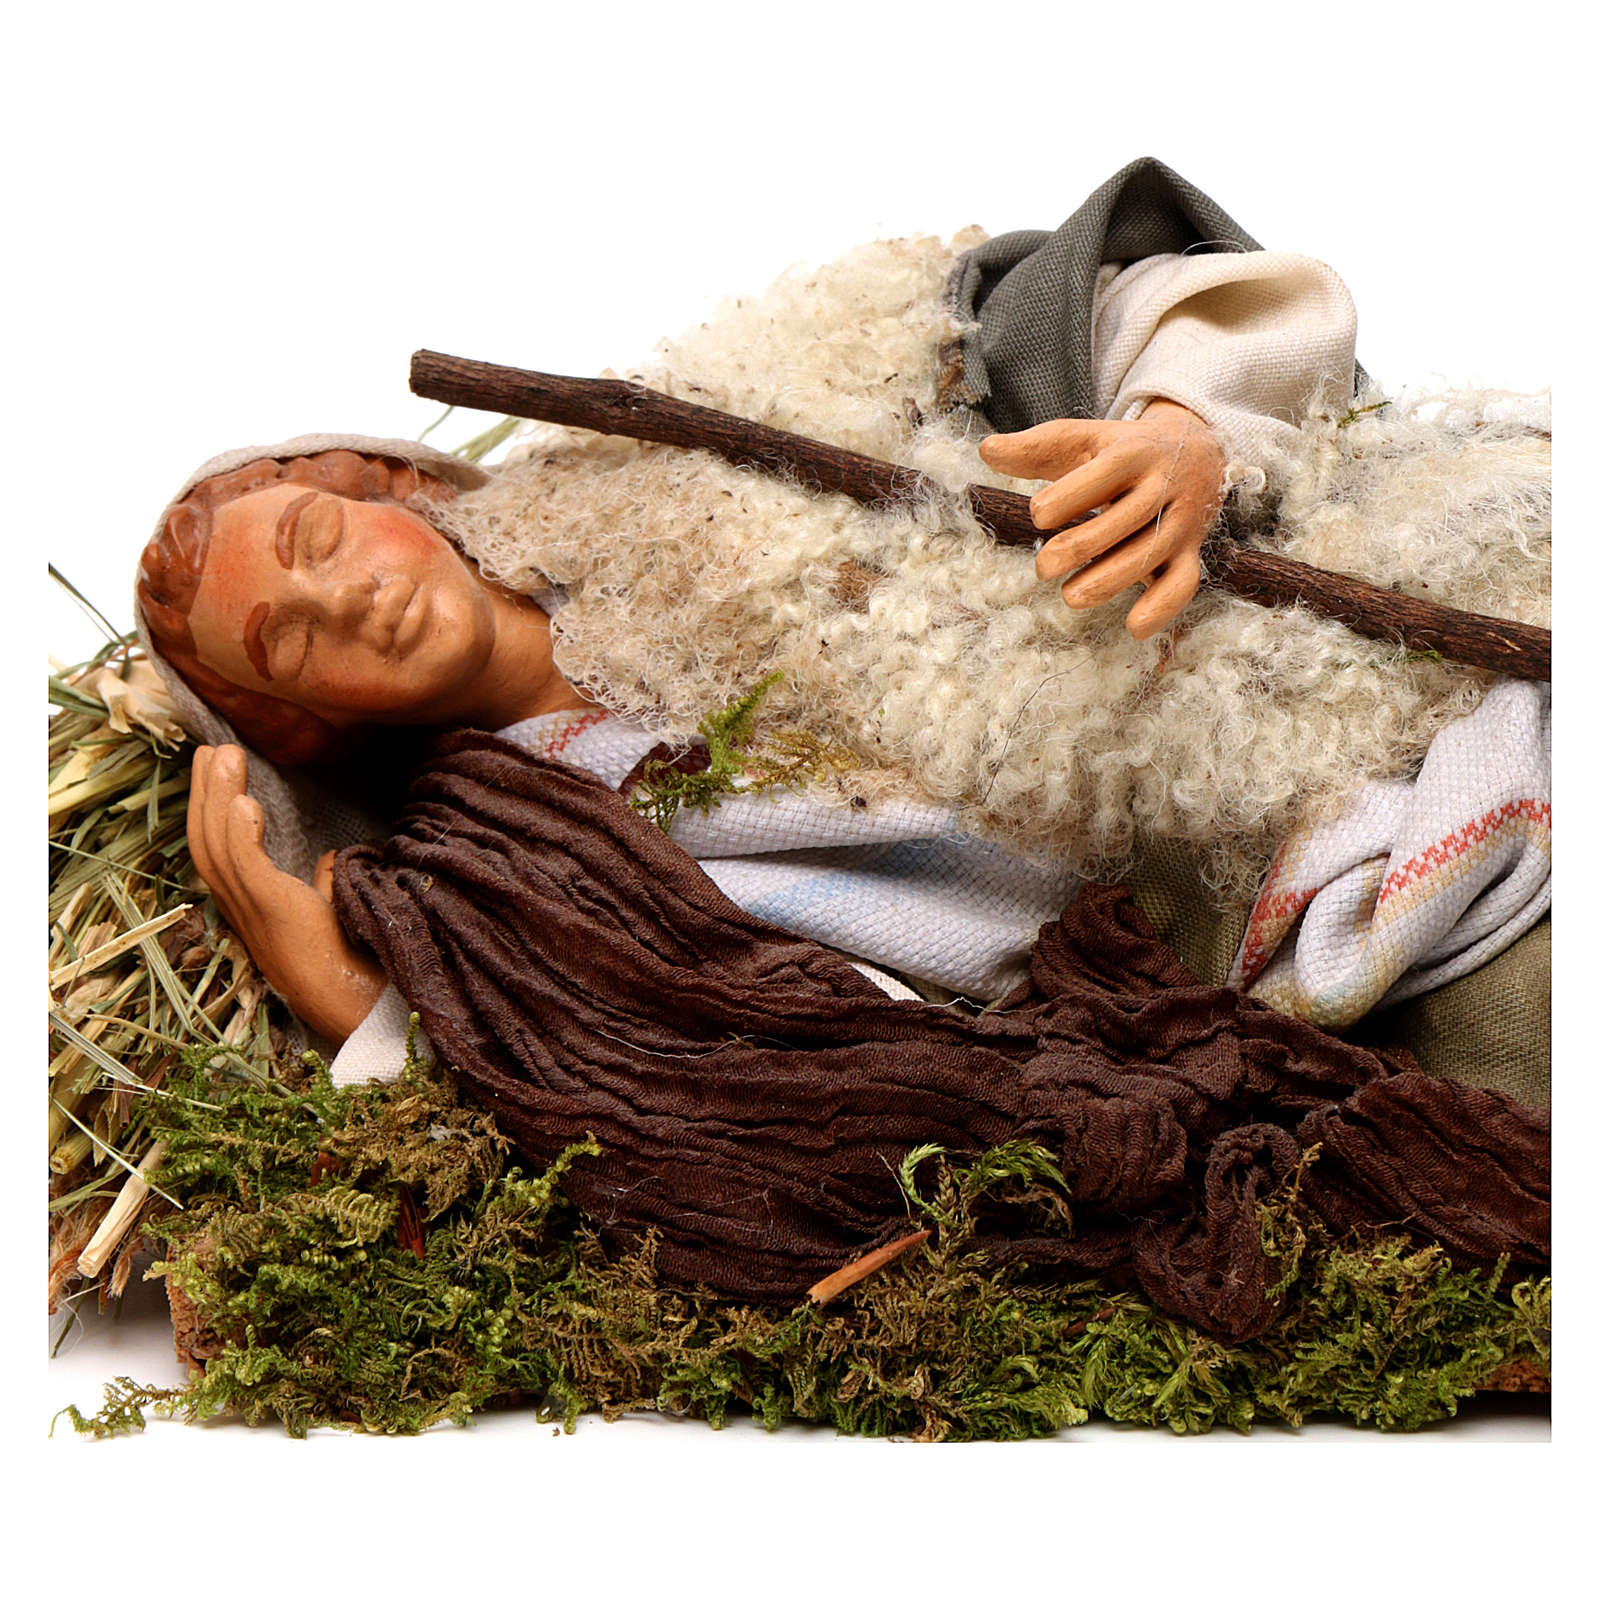 Neapolitan nativity figurine, sleeping man 18cm 4